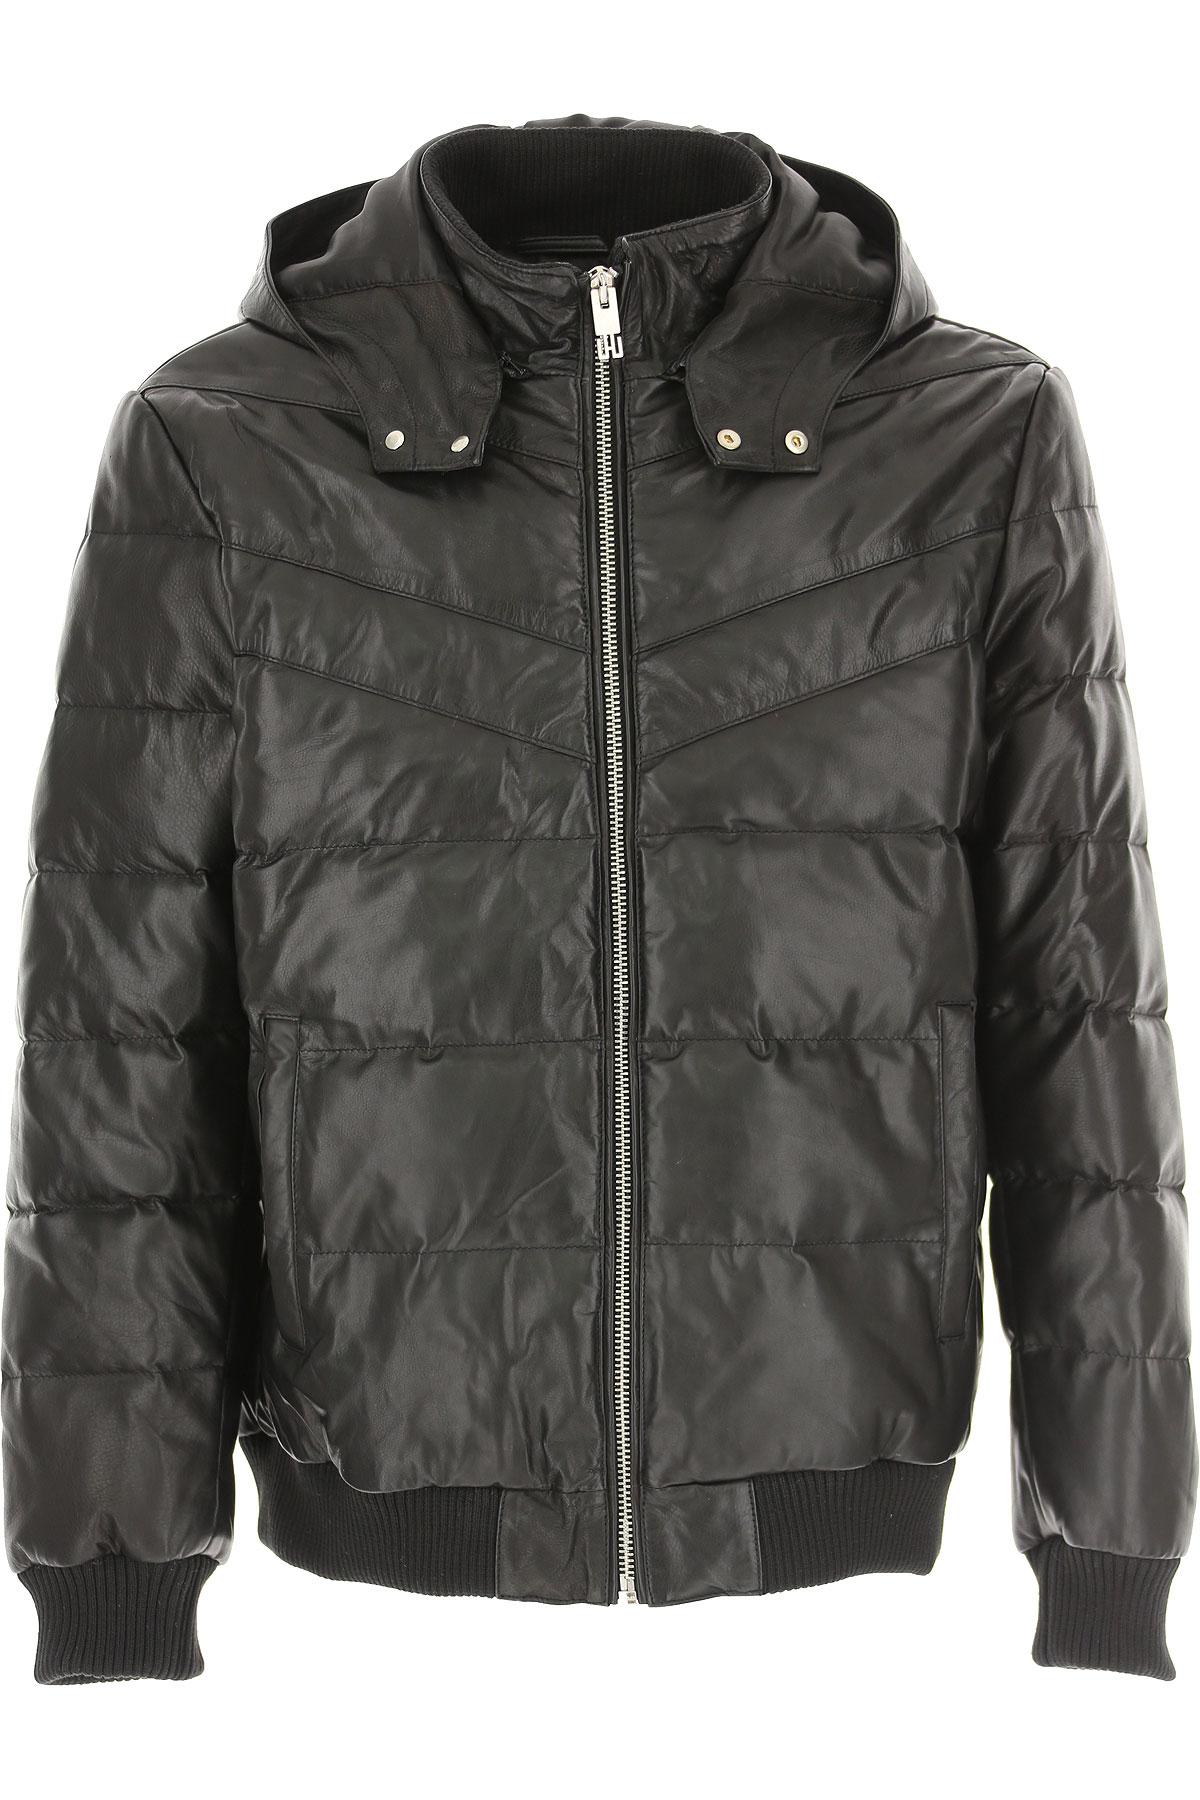 Les Hommes Down Jacket for Men, Puffer Ski Jacket On Sale, Black, Leather, 2019, L M XL